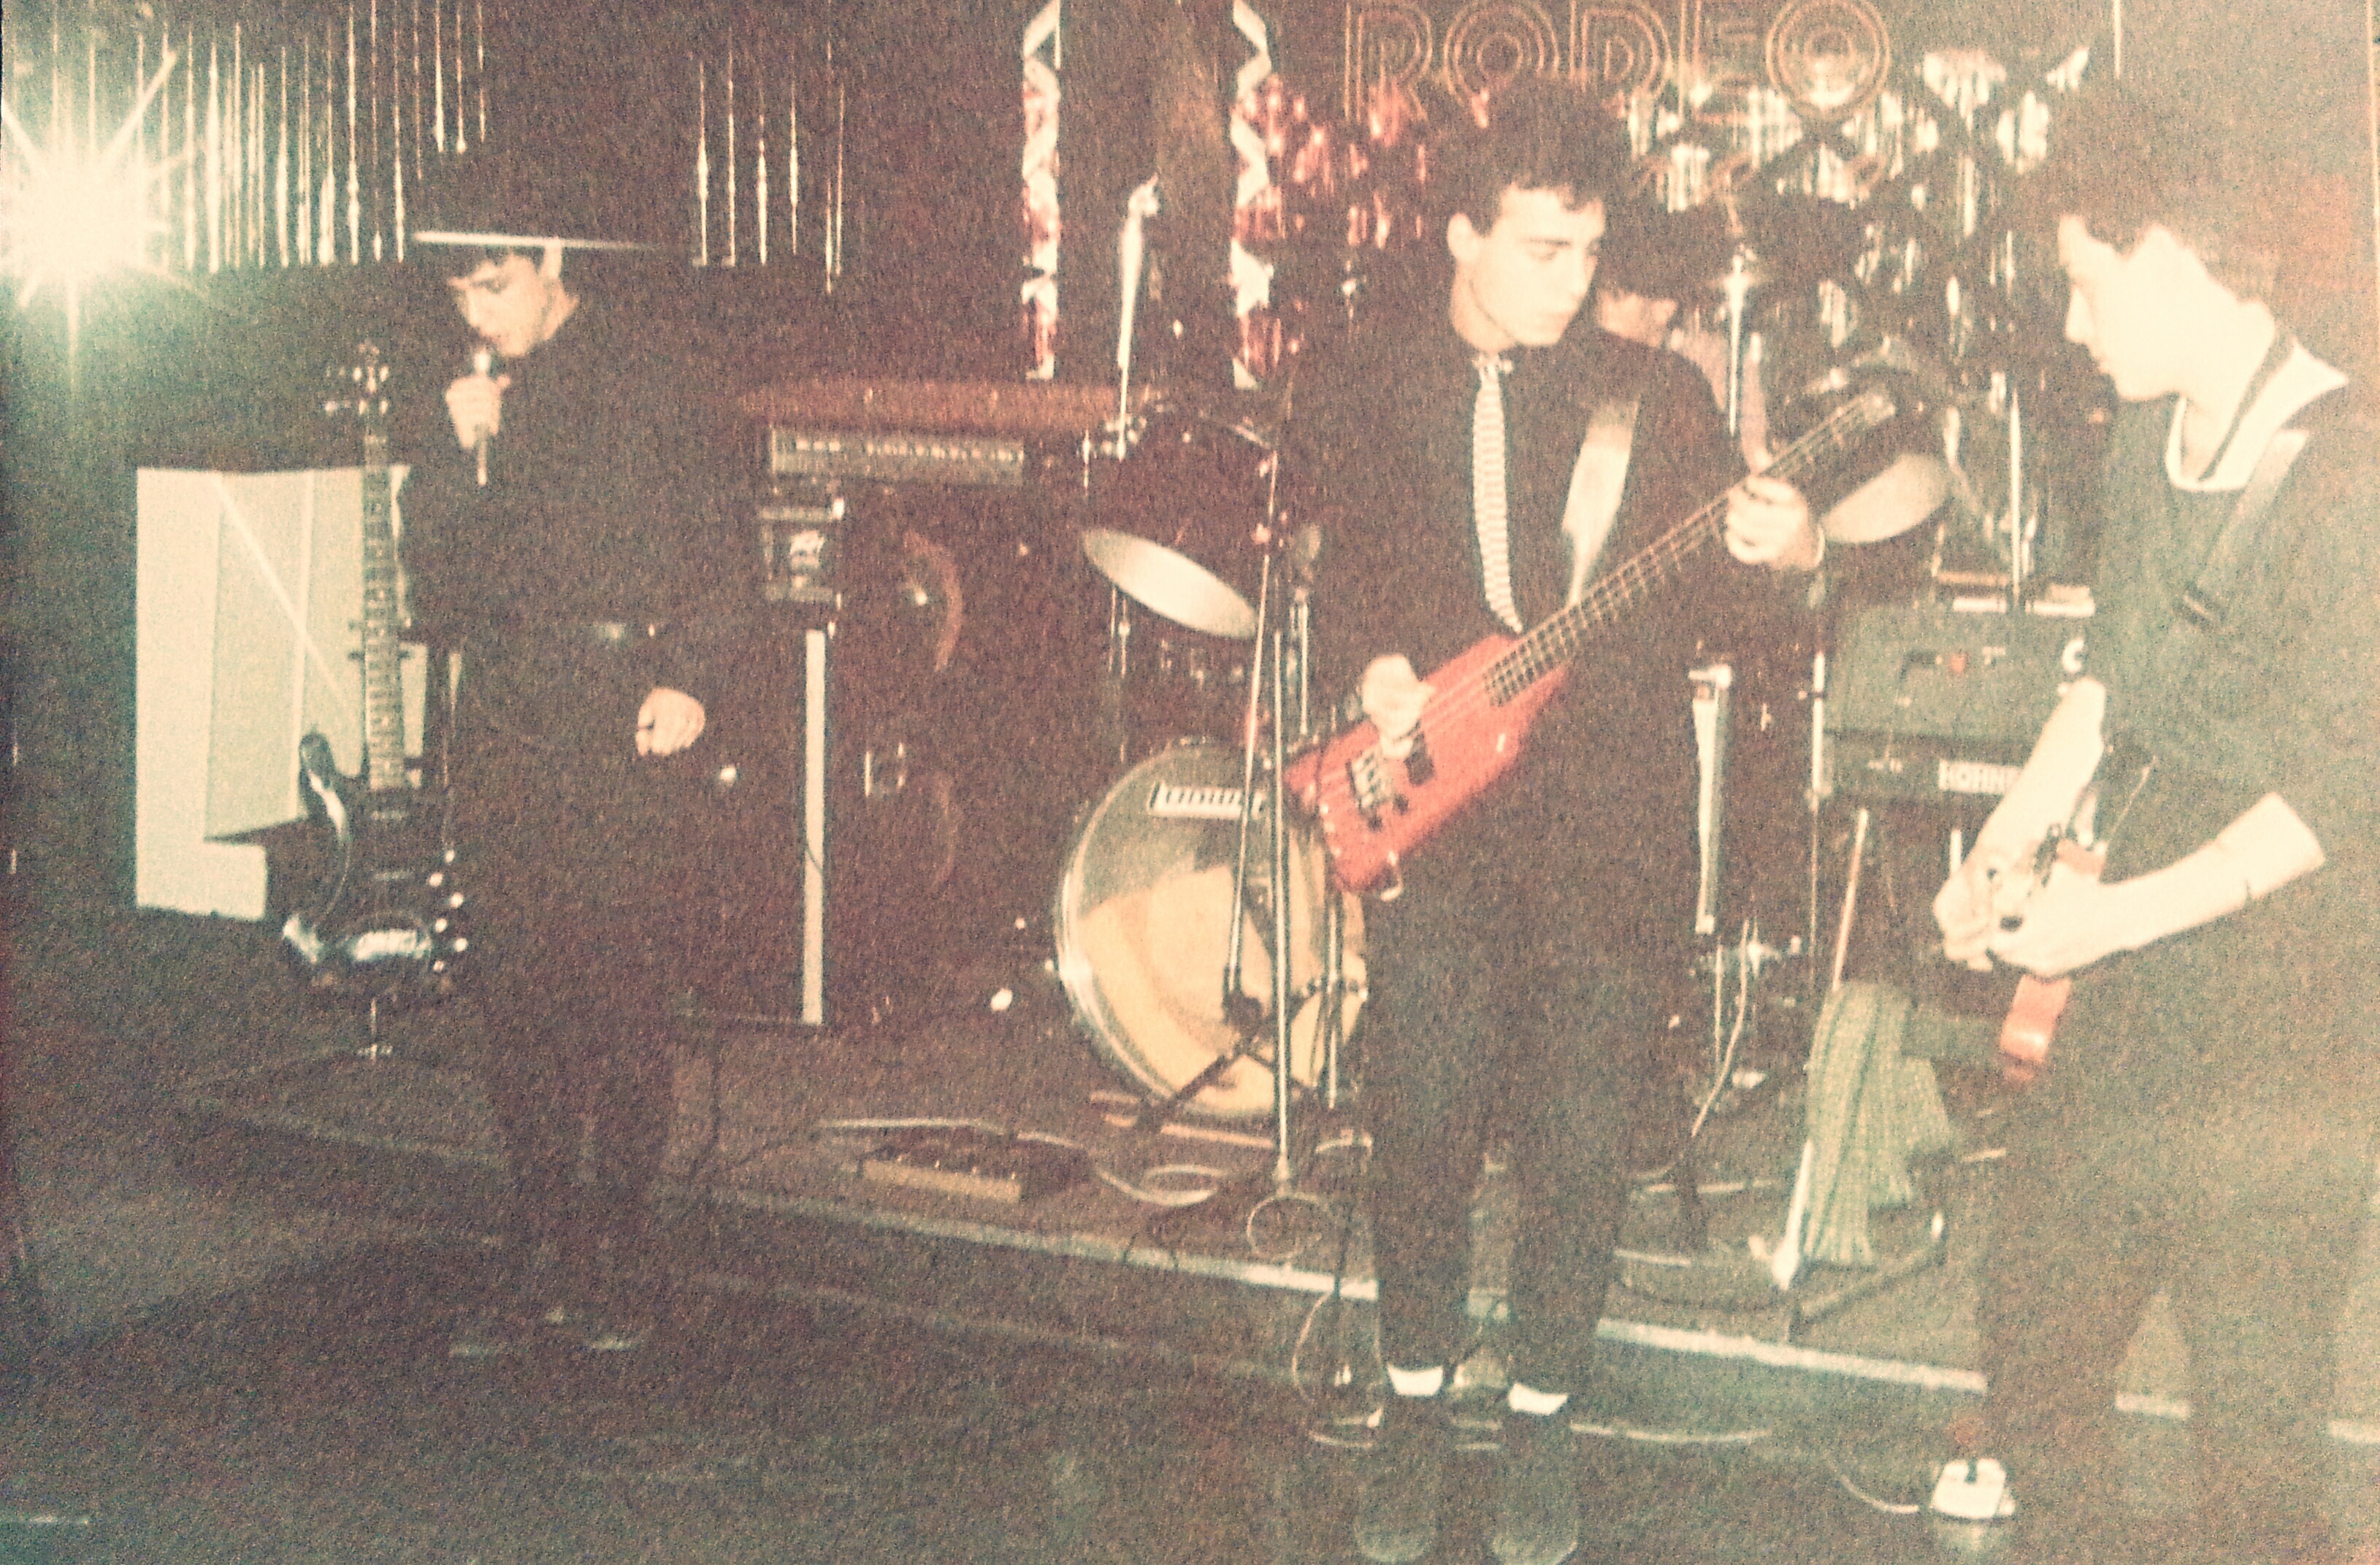 South Of No North Live στο «Rodeo» 1985, Πλατεία Βικτωρίας.